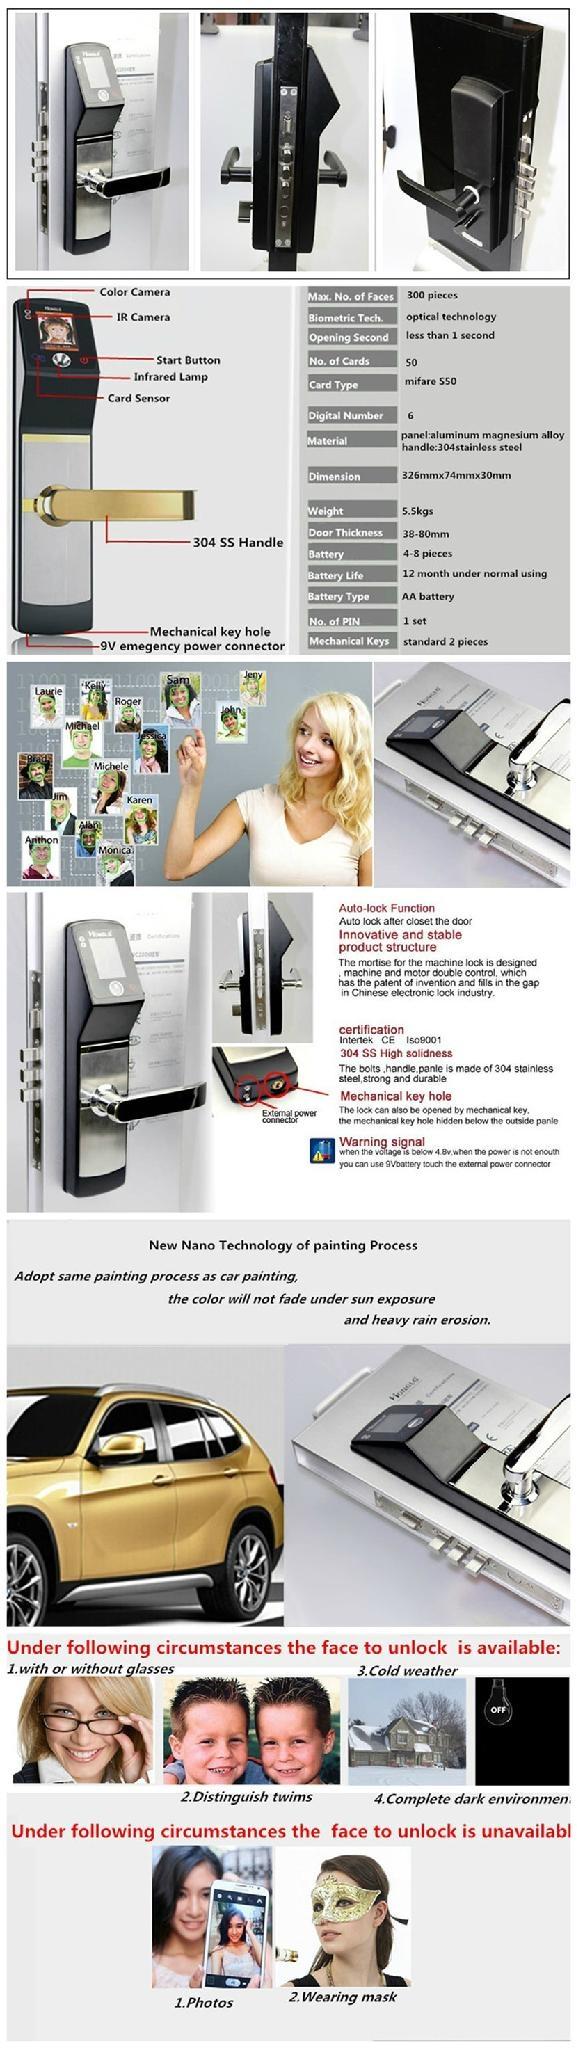 High identification speed Biometric Face Recognition sliding wooden door locks 7